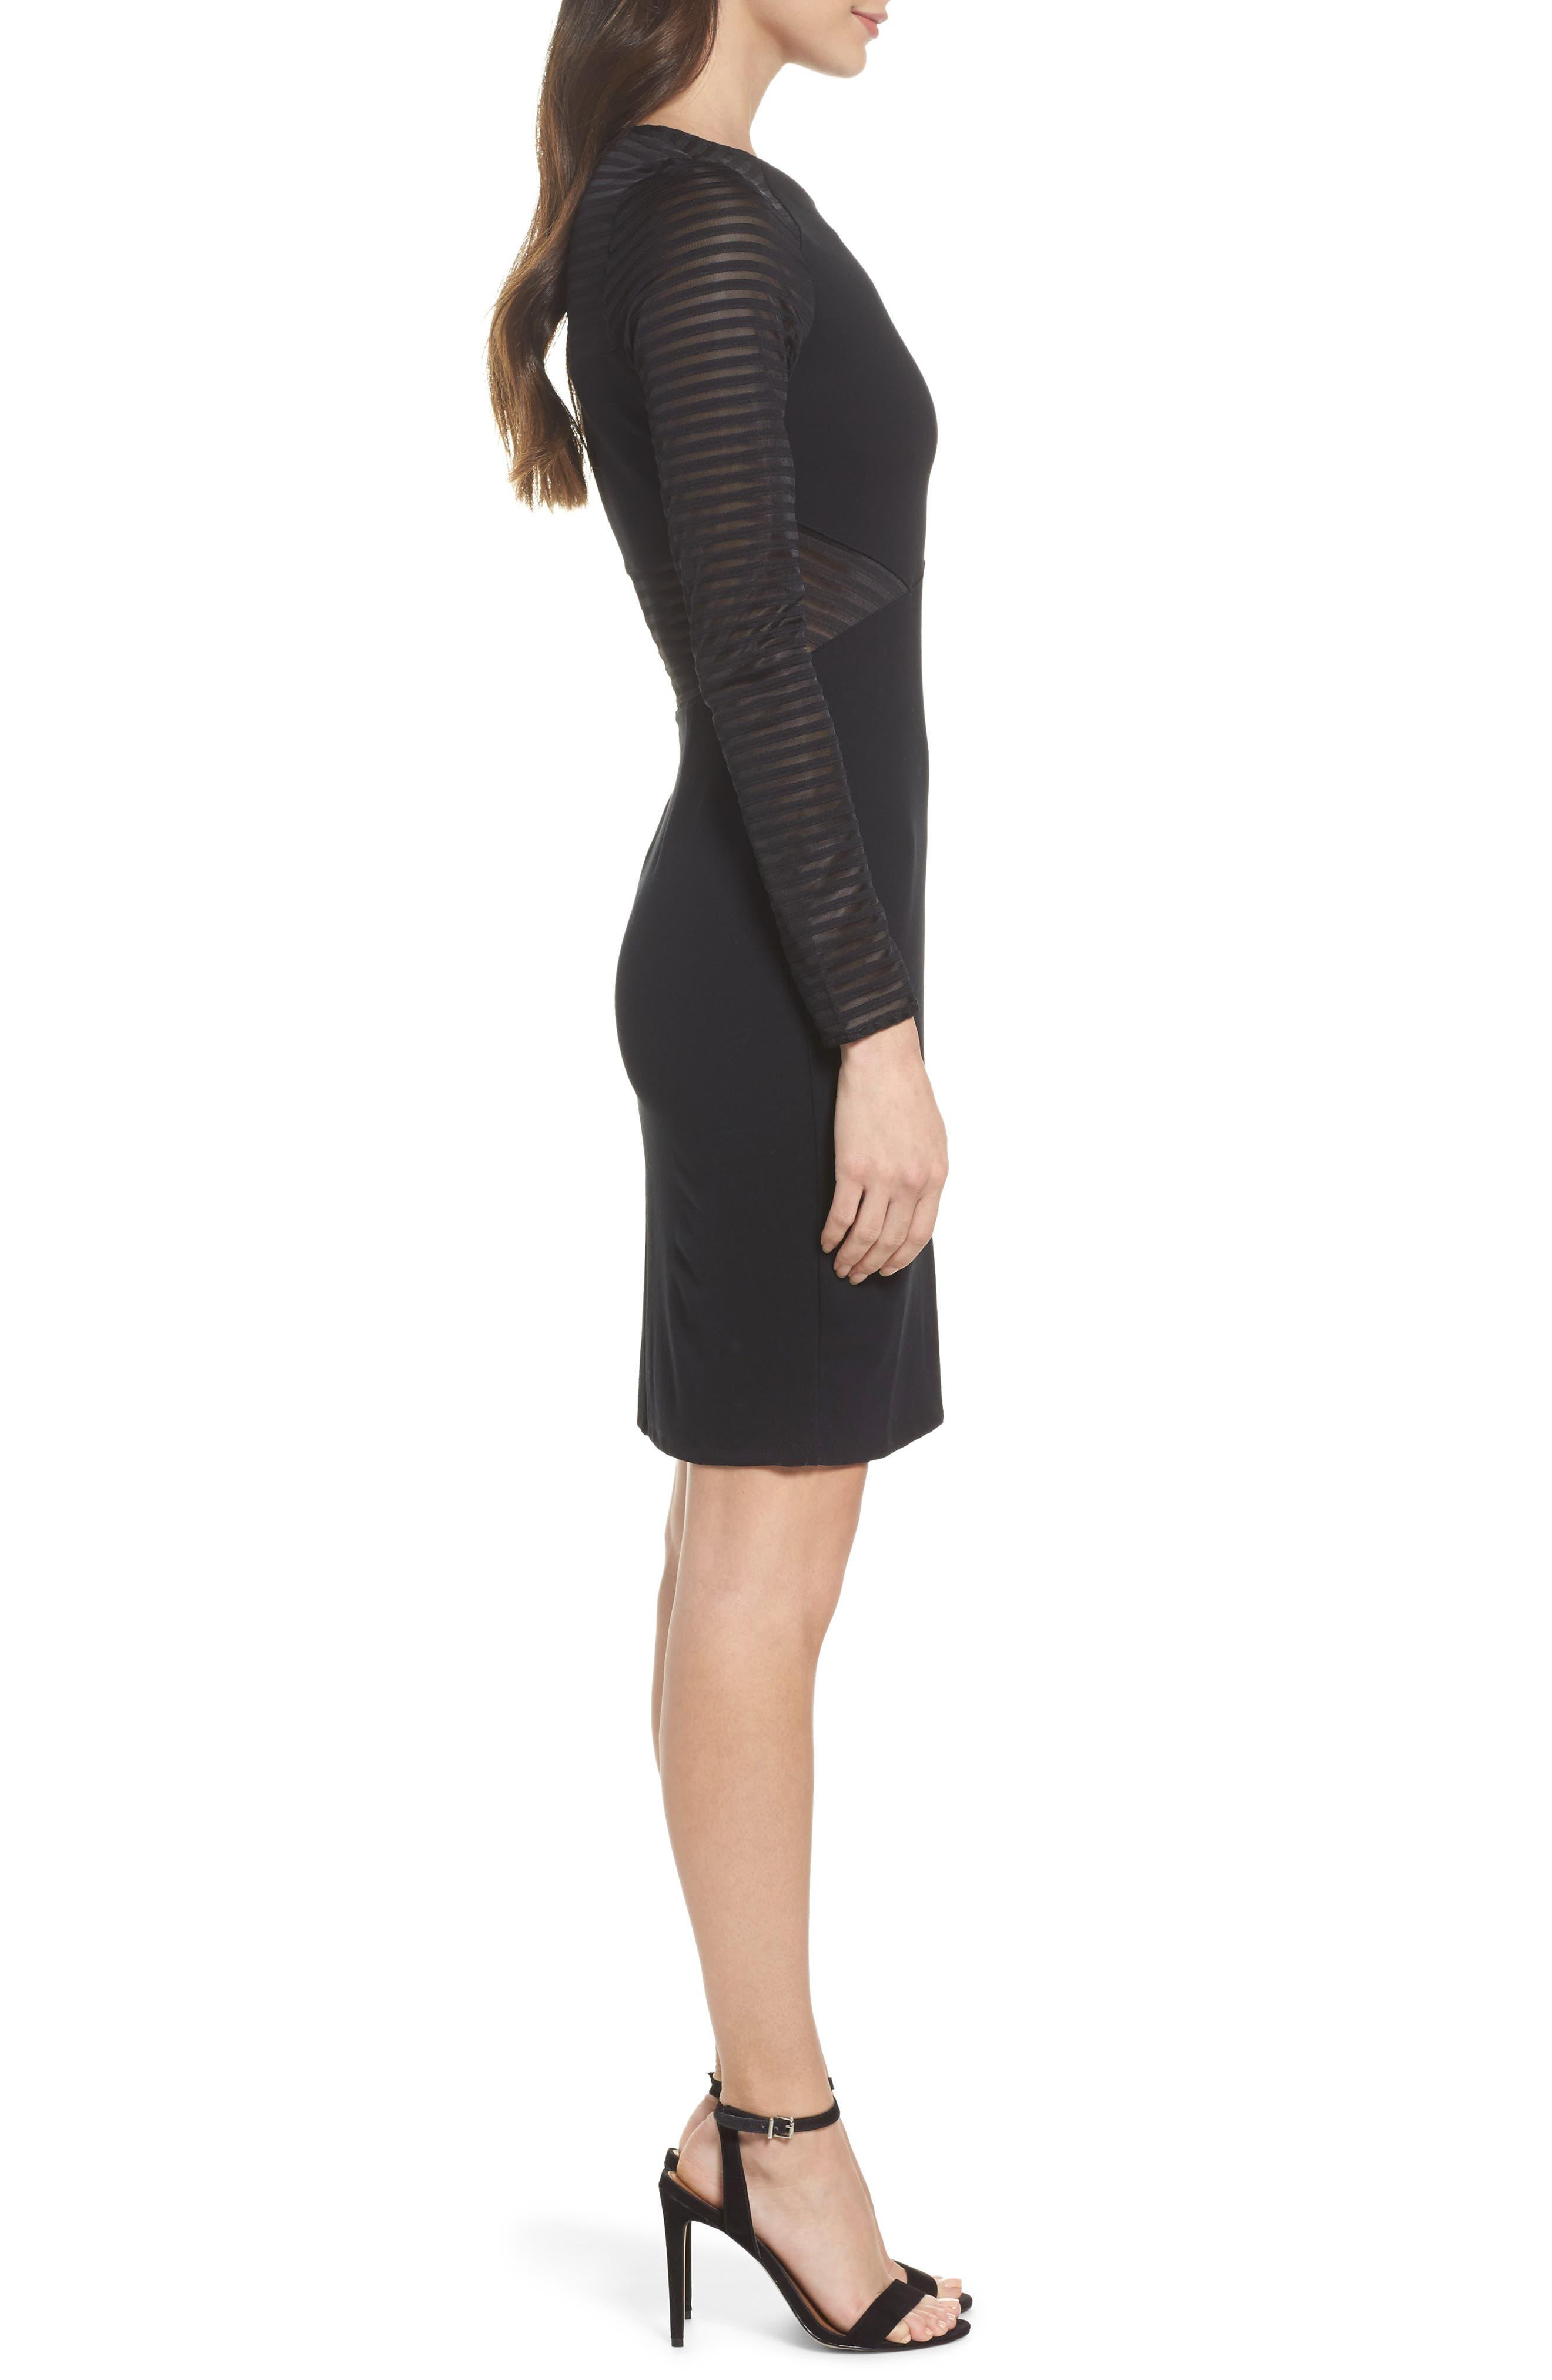 Thiestis Body-Con Dress,                             Alternate thumbnail 3, color,                             002